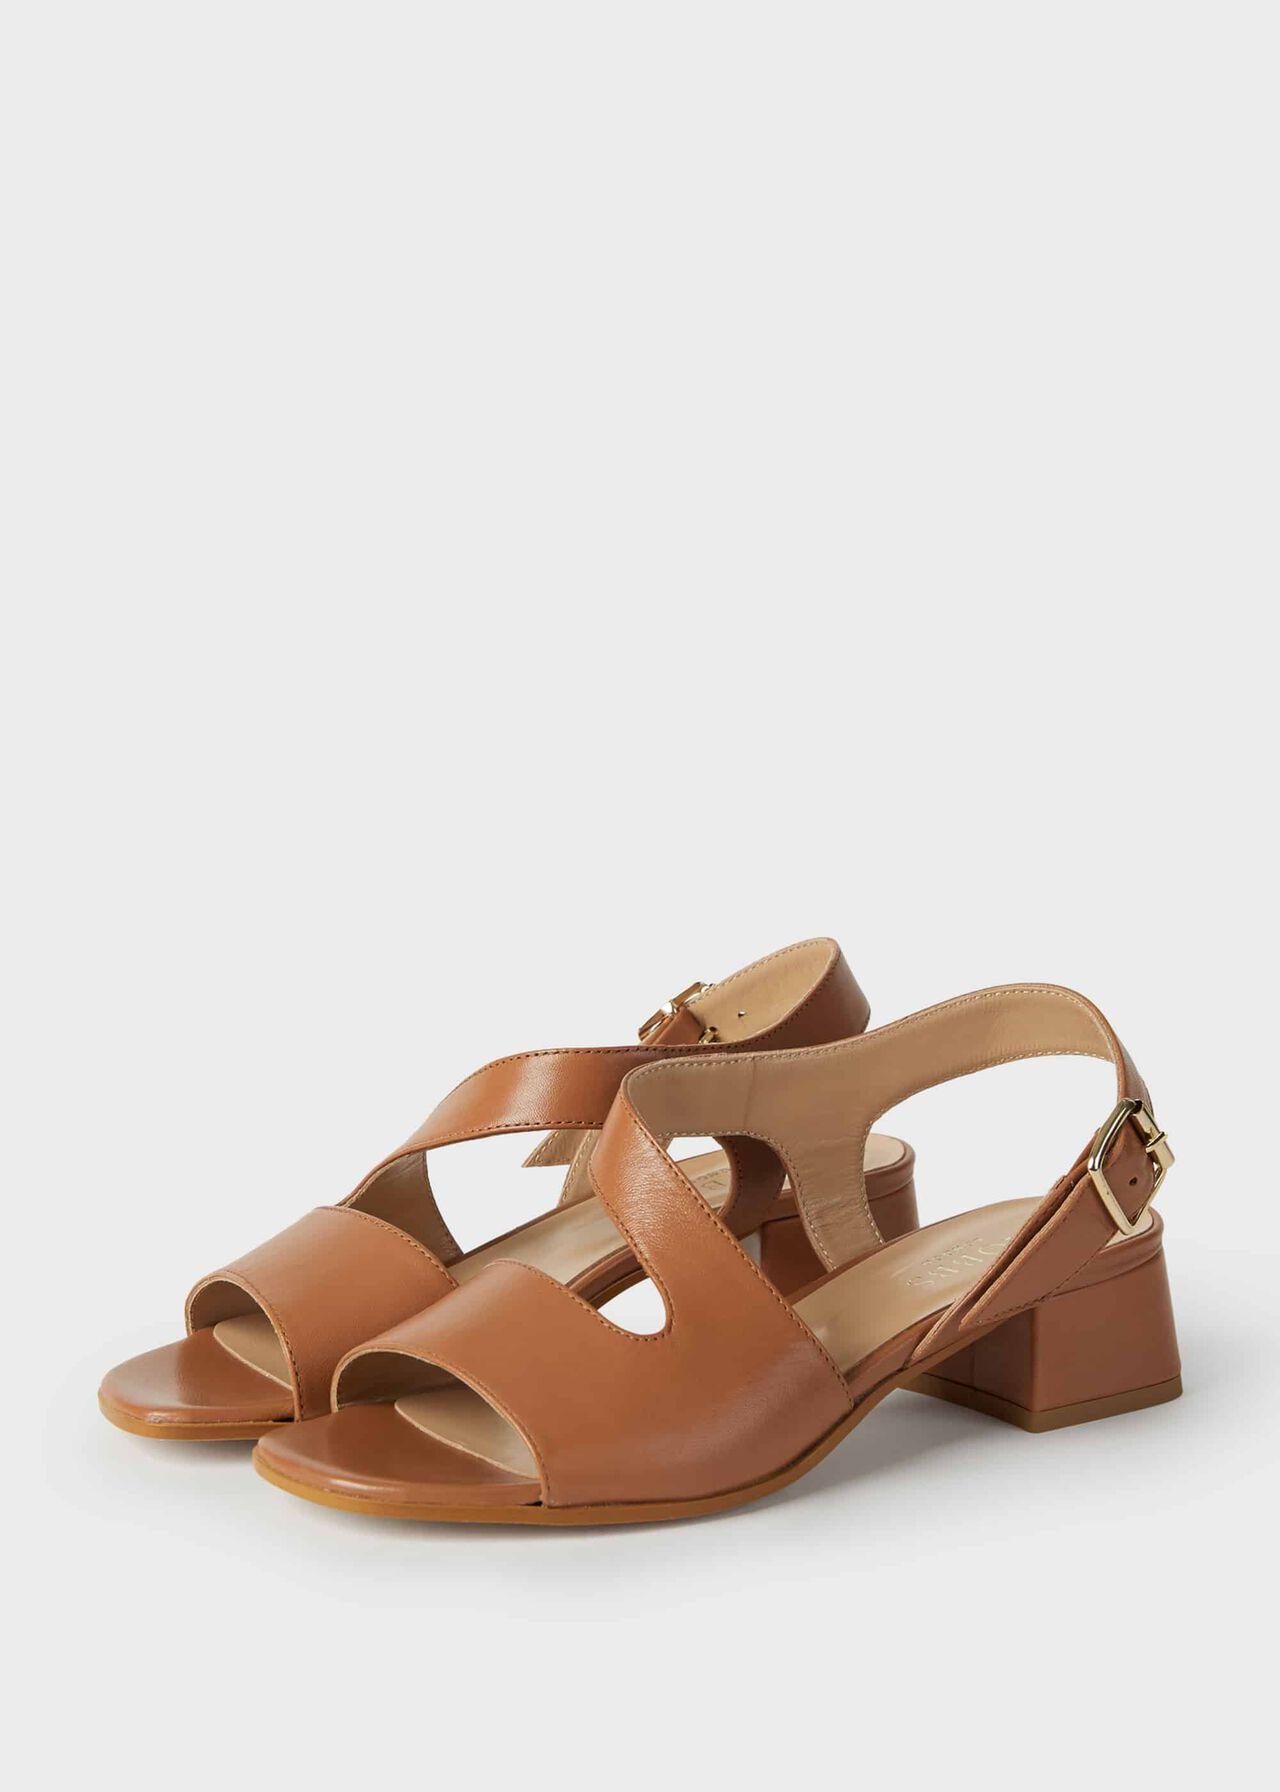 Leather Block Heel Sandals Toffee